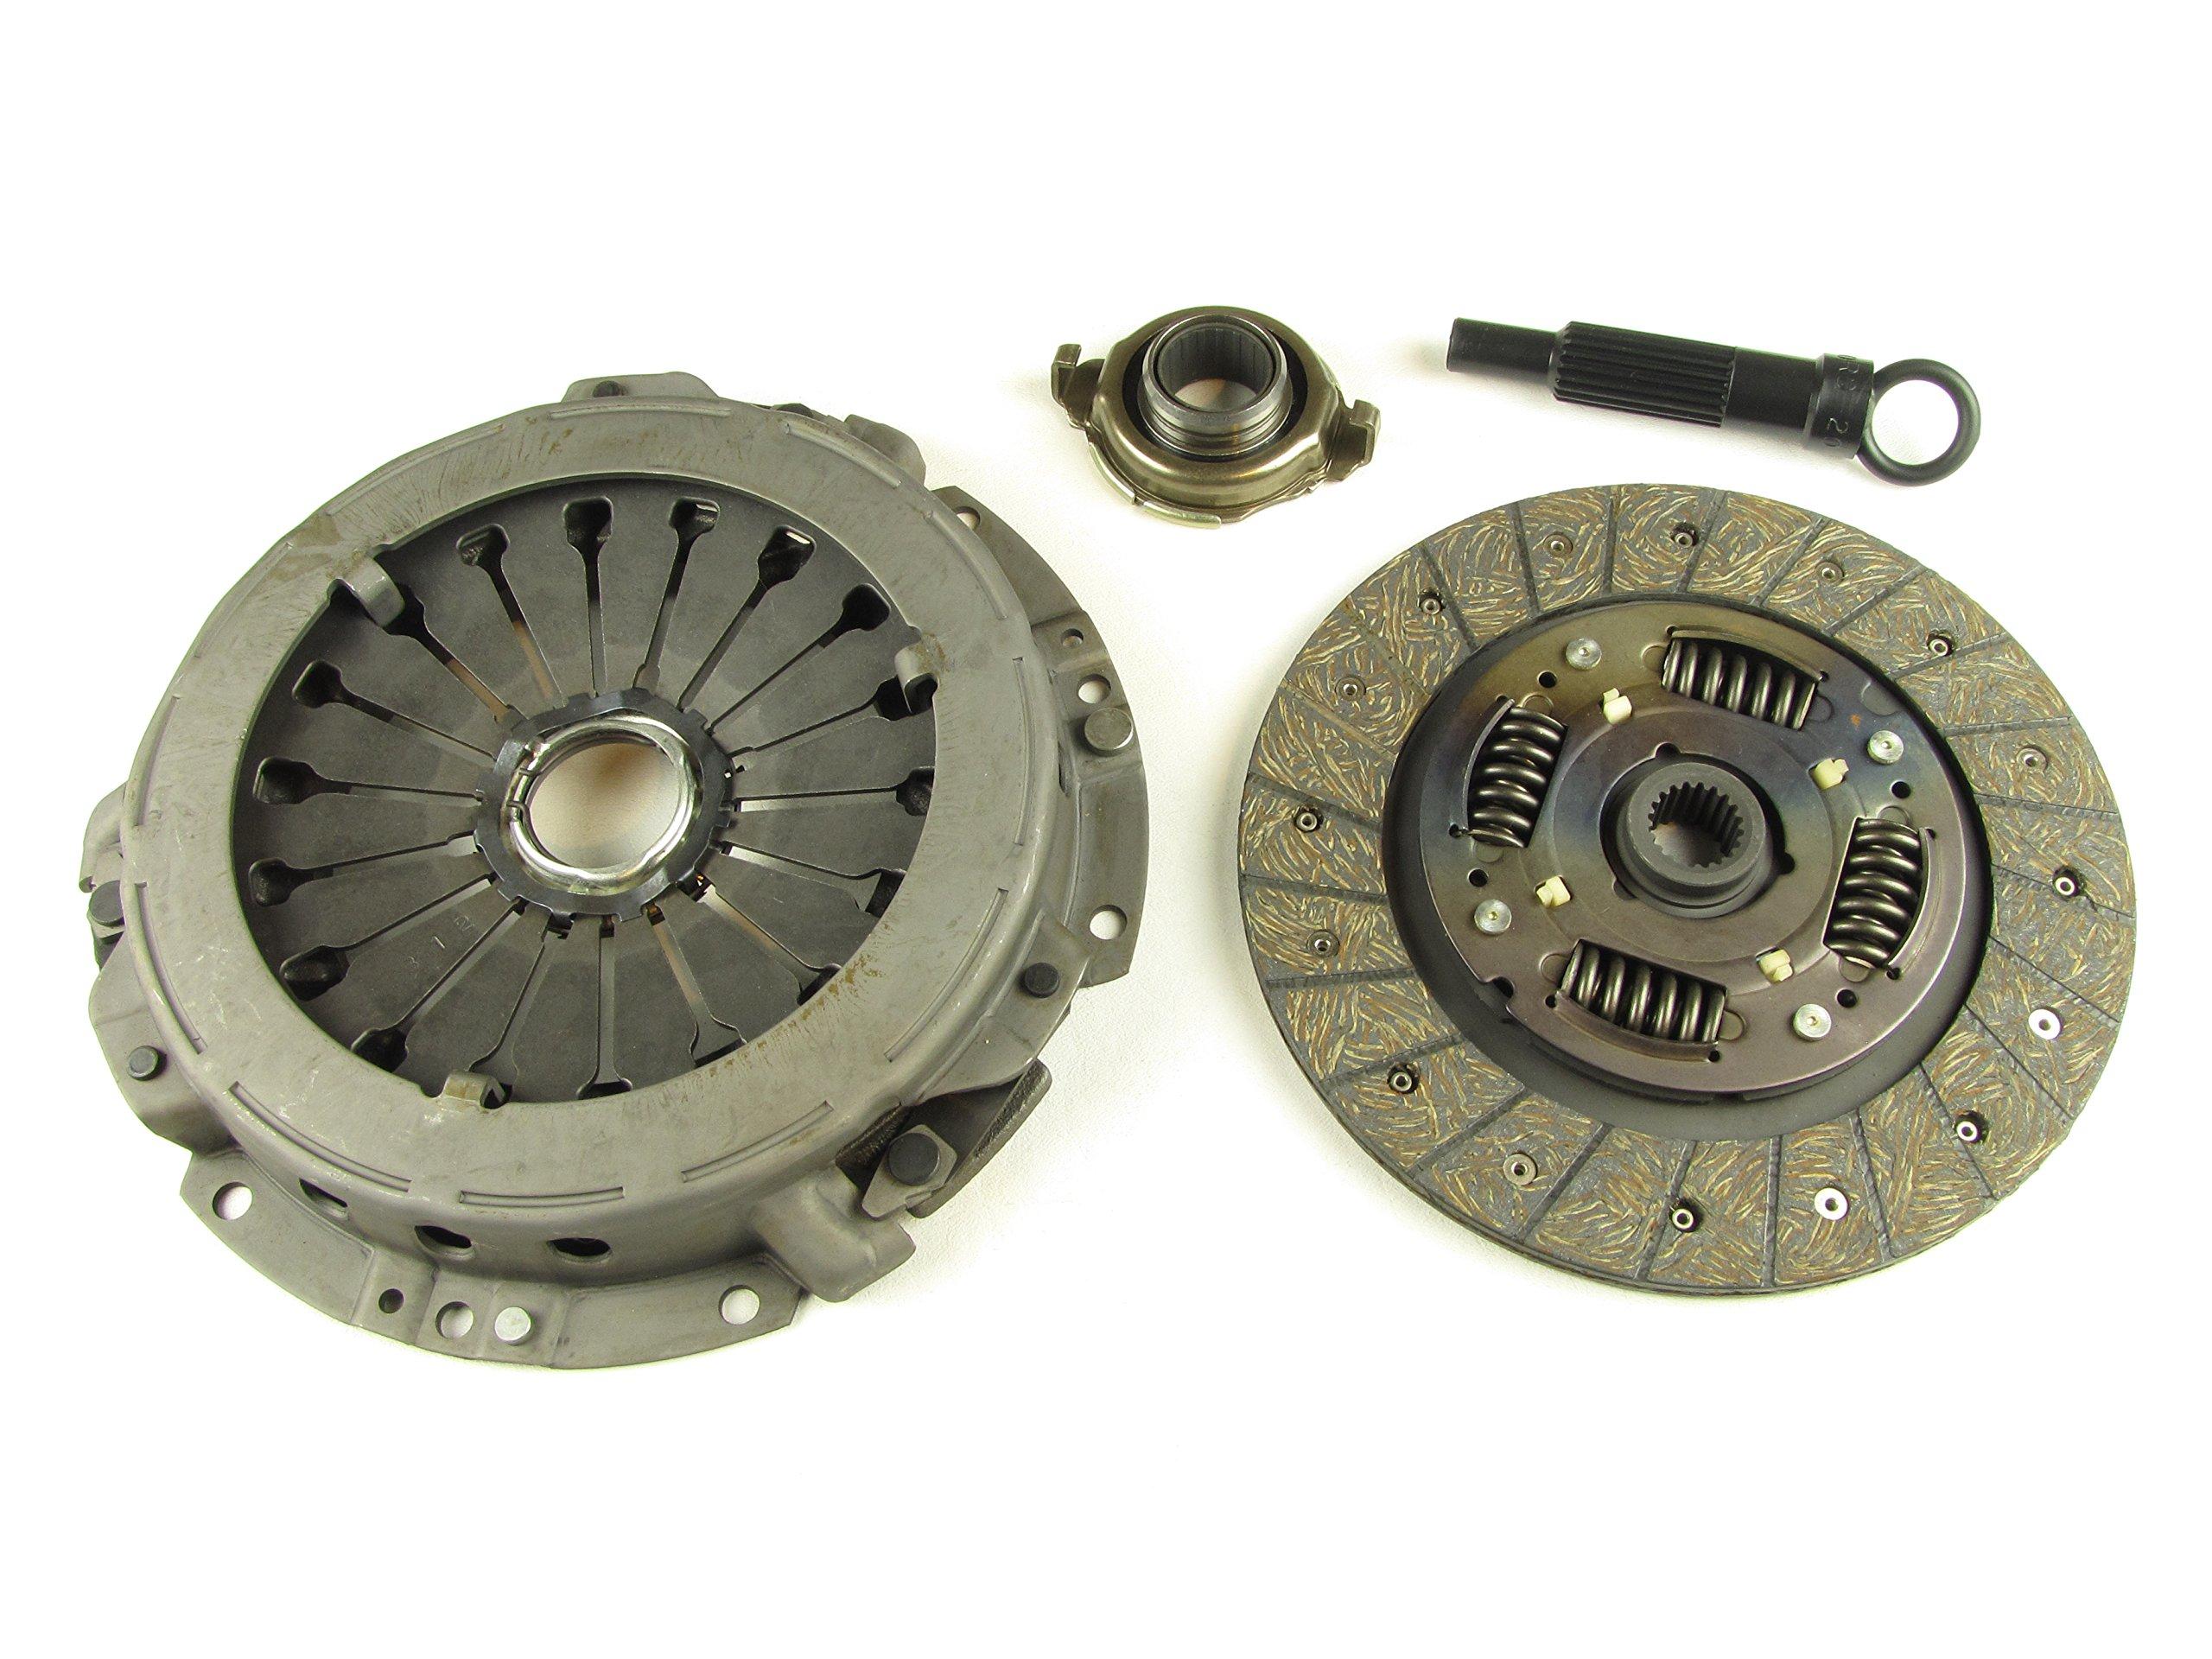 Standard Clutch Kit for Hyundai v4 v6 1.8L 2.0L 96-08